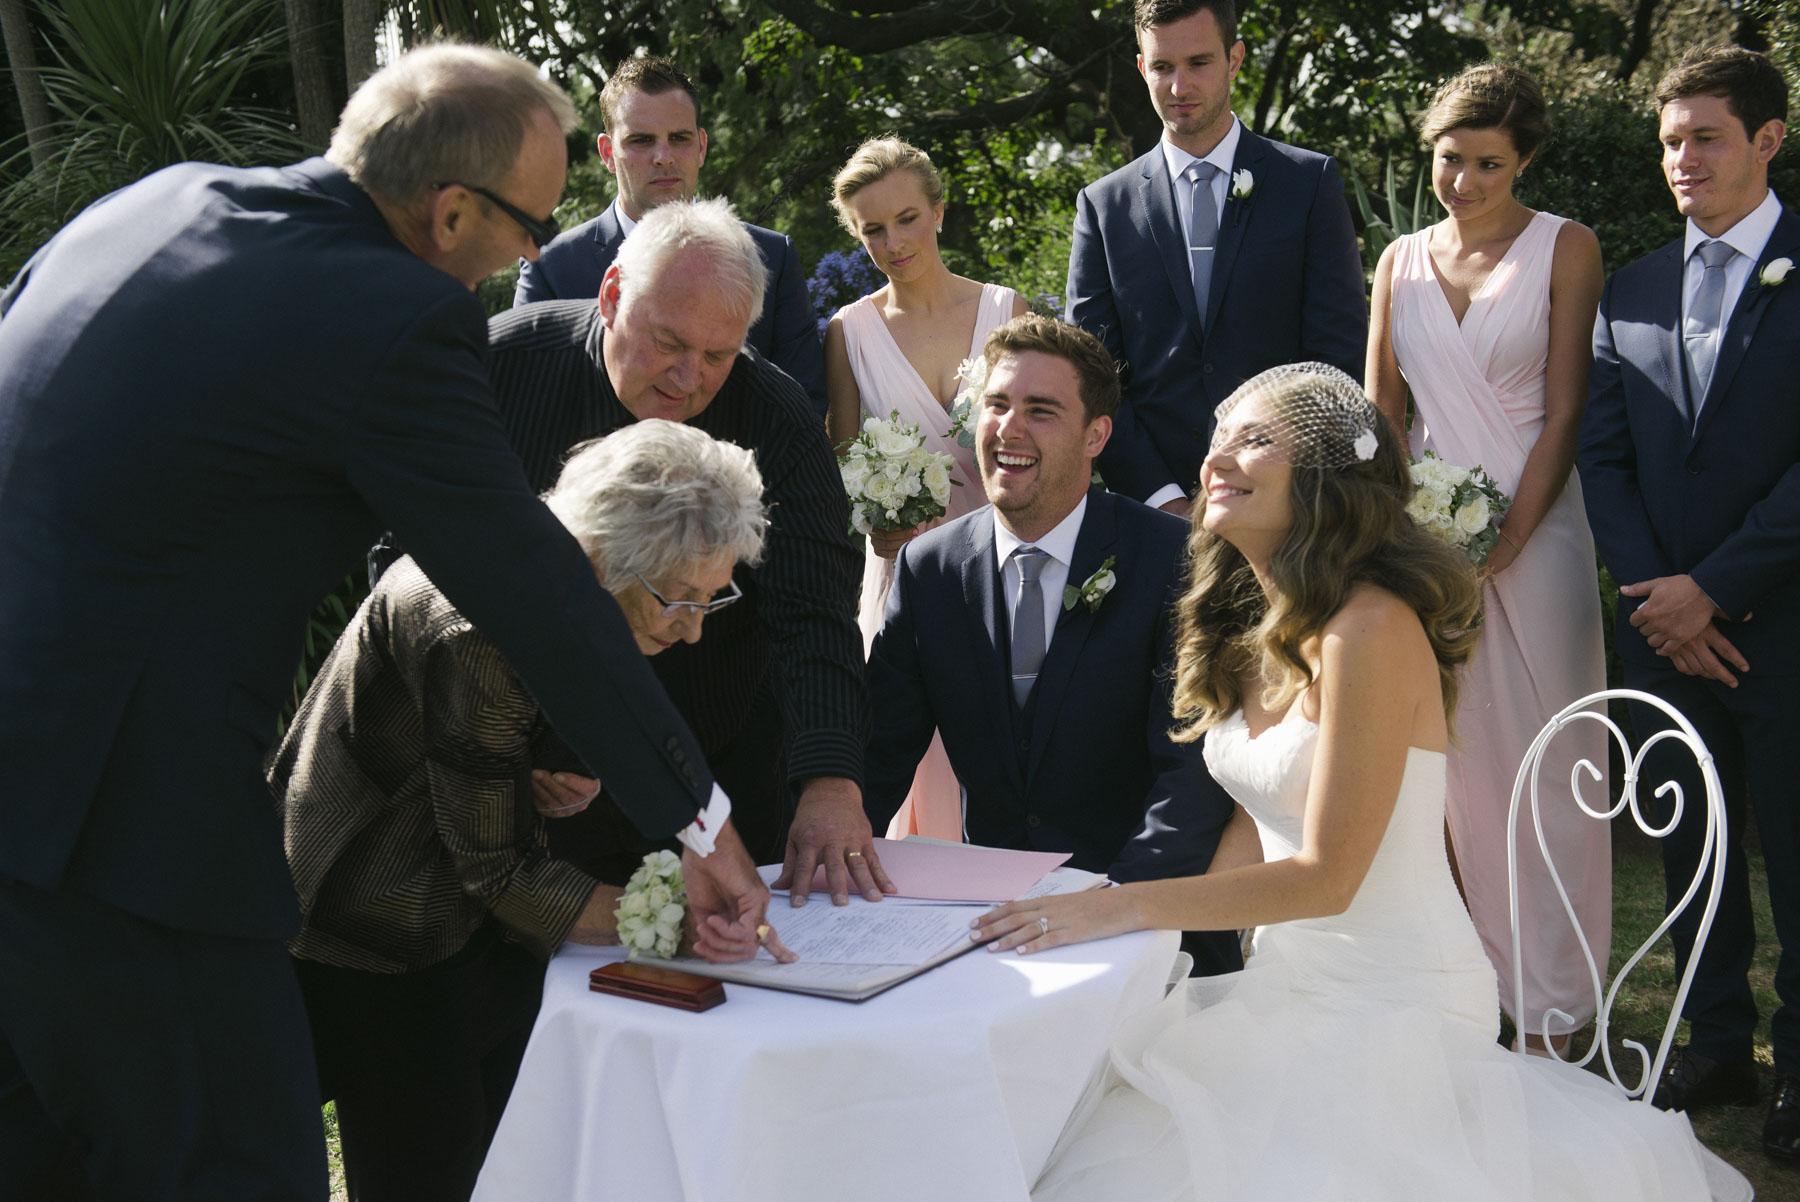 1501vand-198alan_moyle_wedding_portrait_brighton_bayside_werribee_estate_mansion_zoo_rustic_styled_garden_mansion_candid_documentry_victoria_whitelaw.jpg